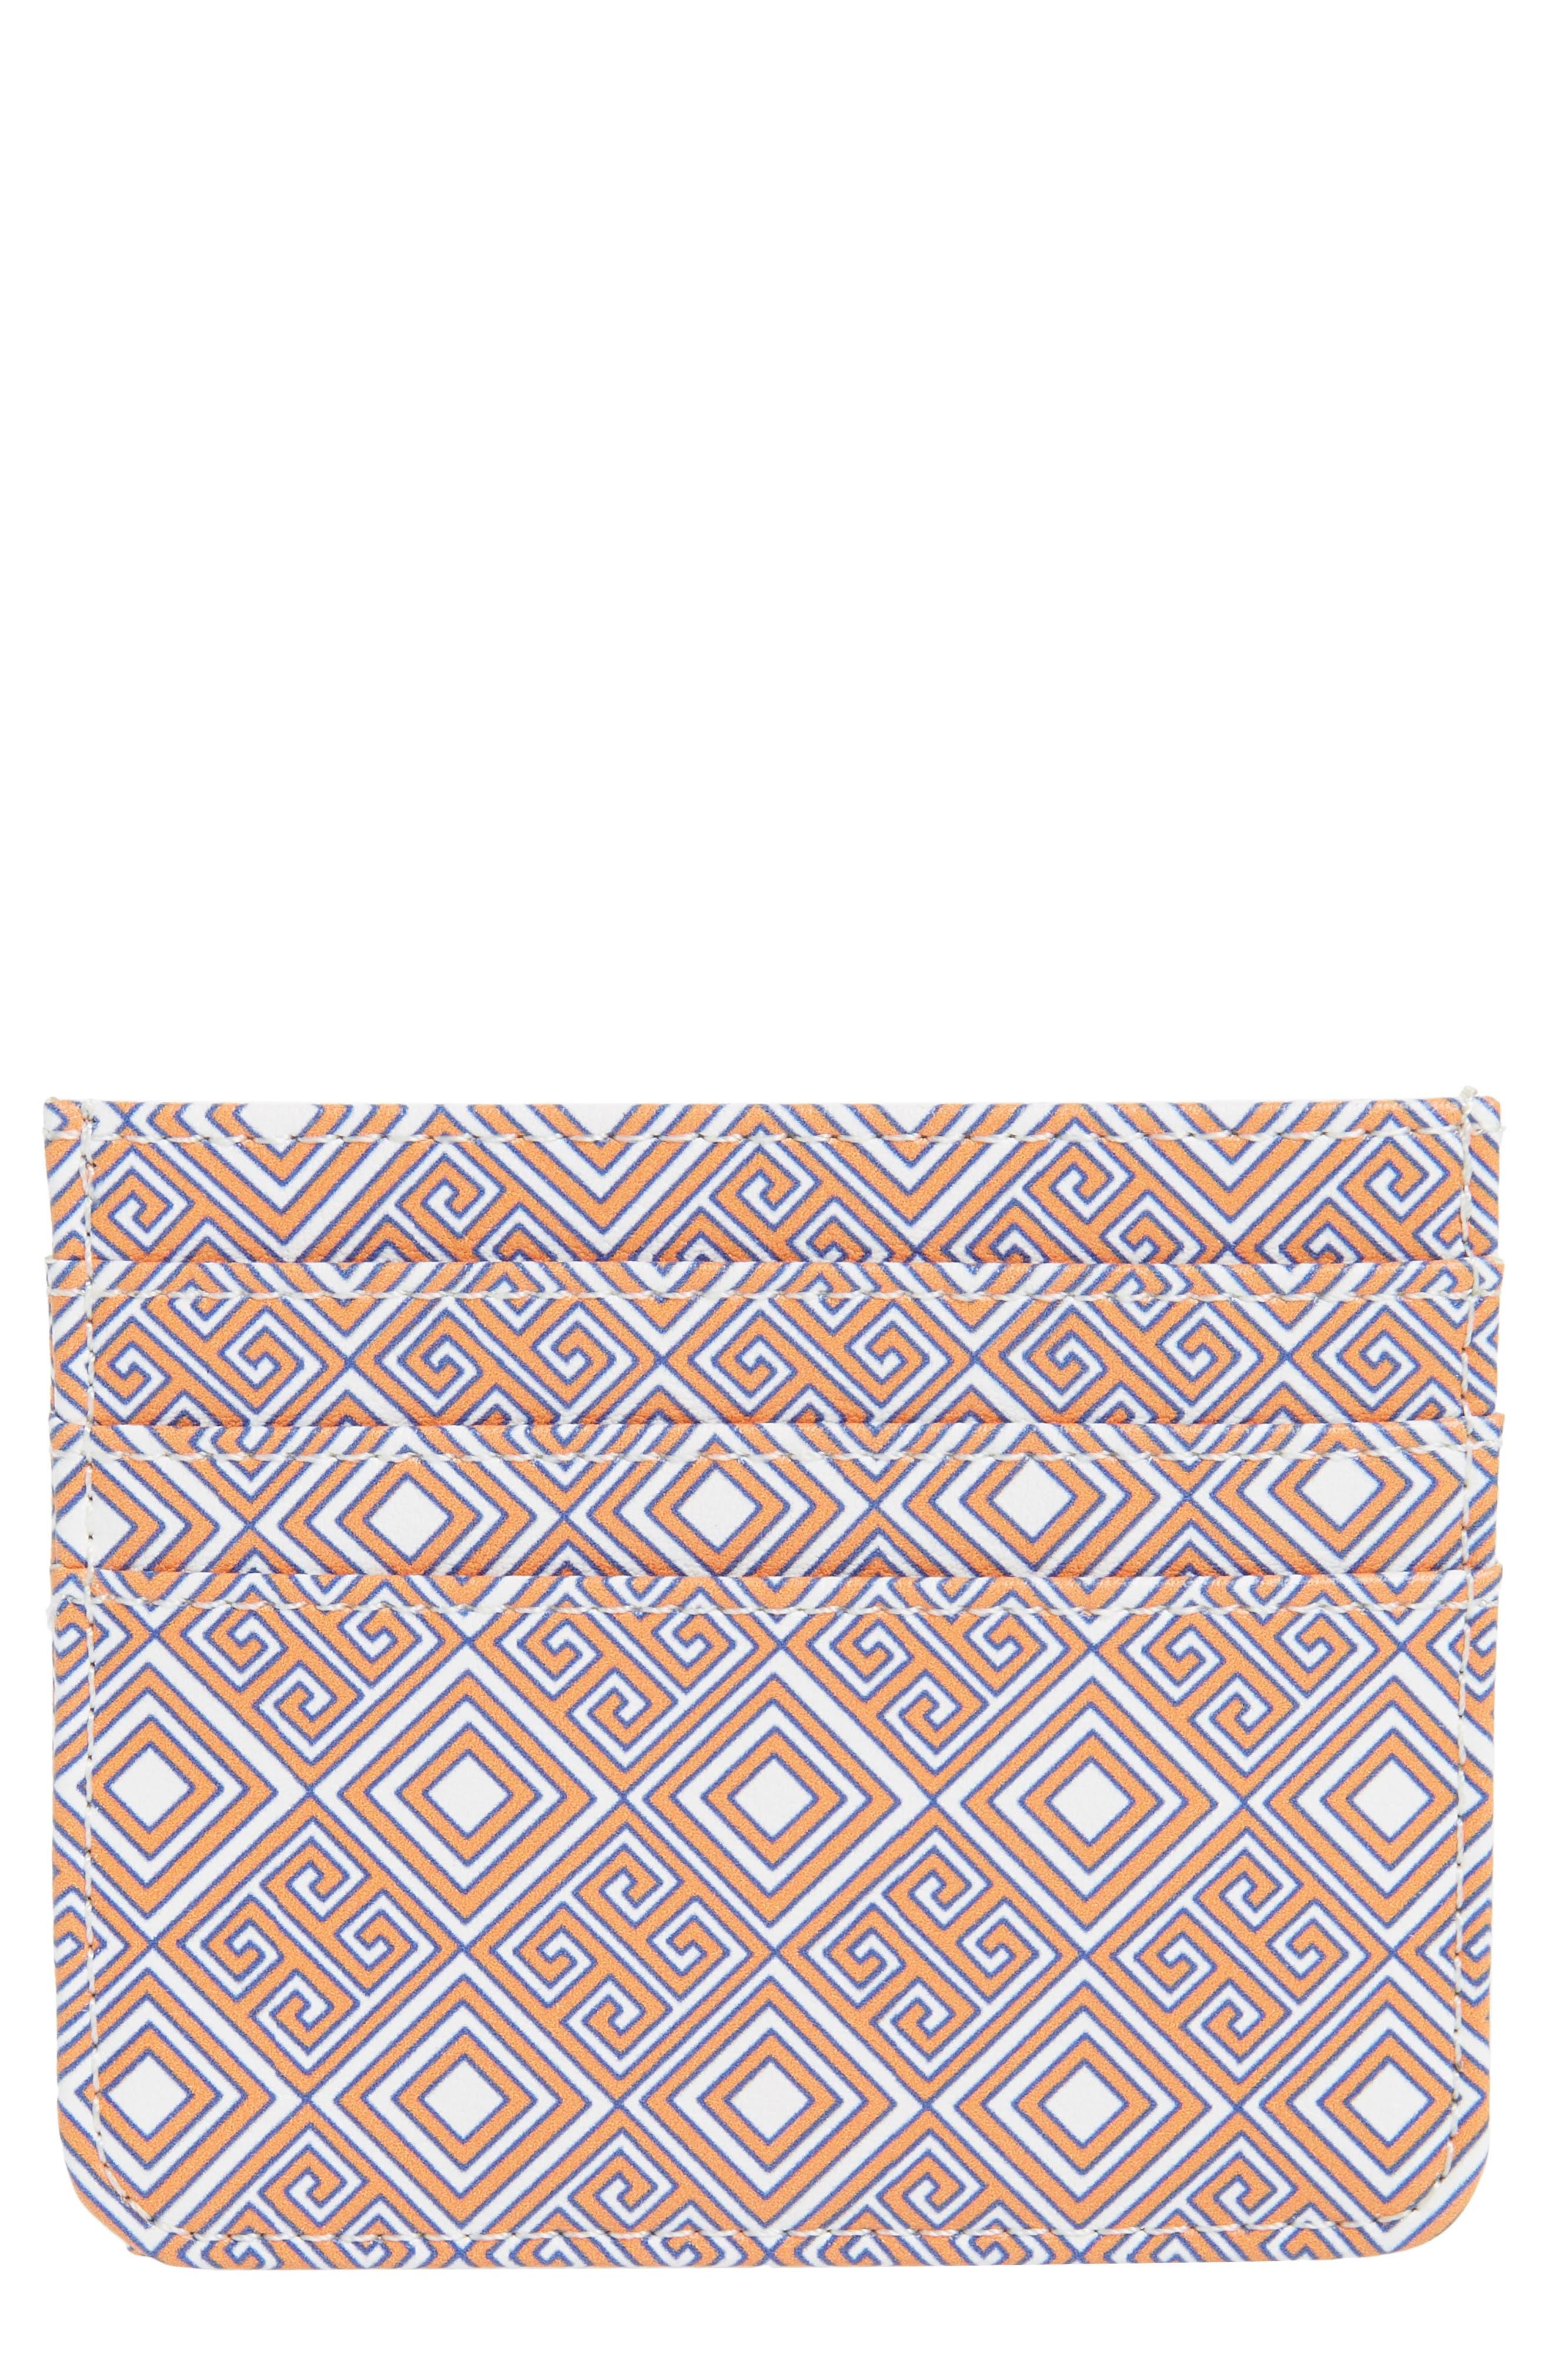 Faux Leather Card Case,                             Main thumbnail 1, color,                             800